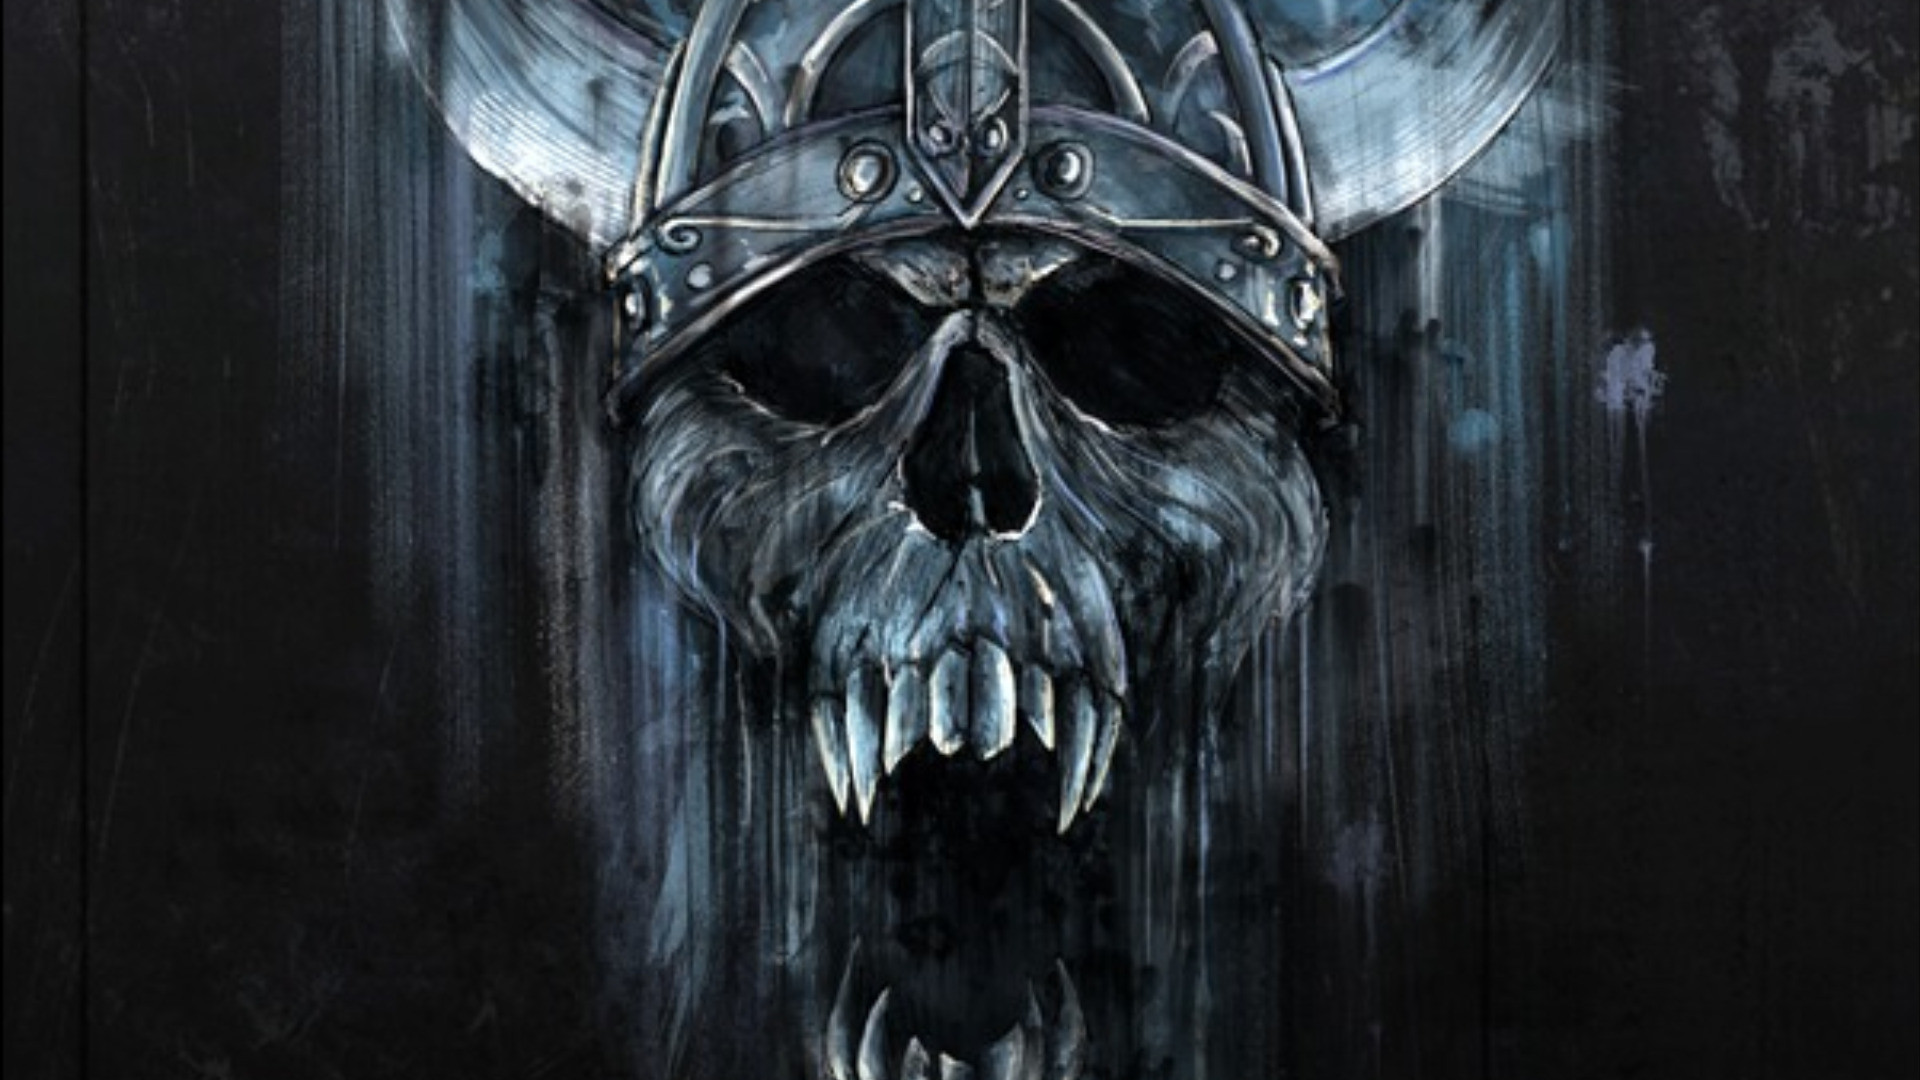 0 Best Skull Wallpapers Collection of Best Skull Wallpaper on Spyder  Wallpapers